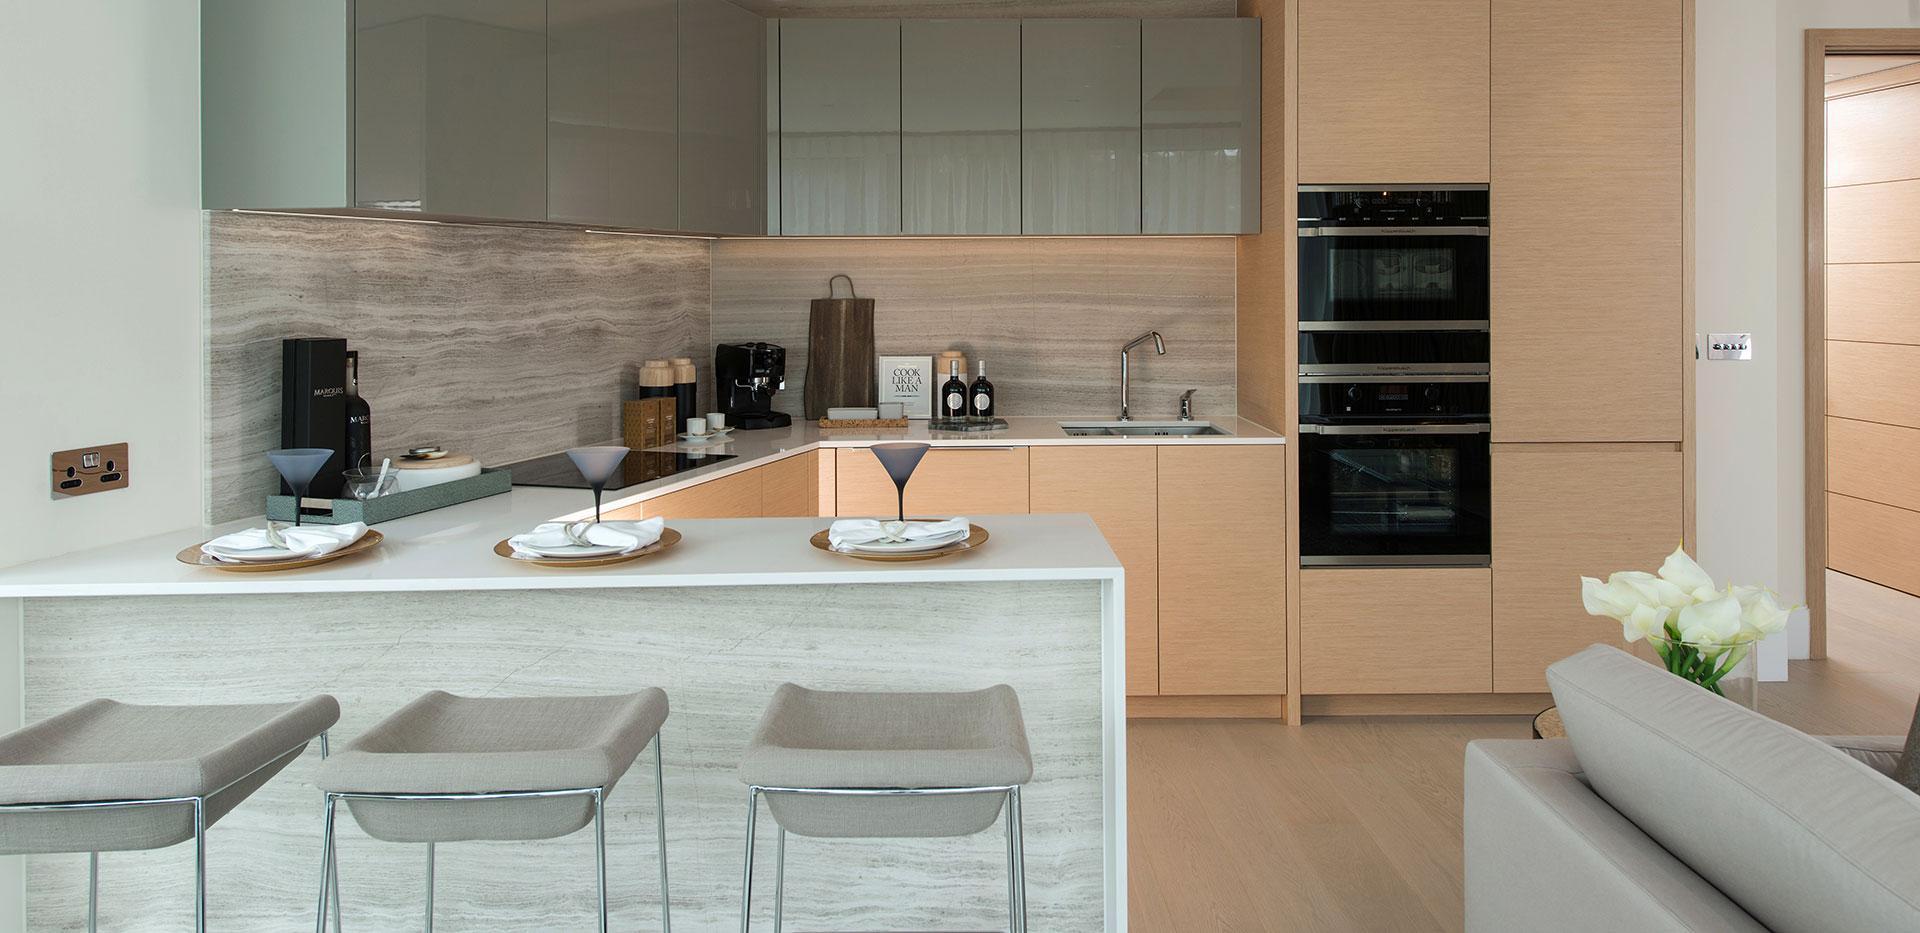 375 Kensington High Street, Benson House, Penthouse Show Apartment, Terrace, Evening